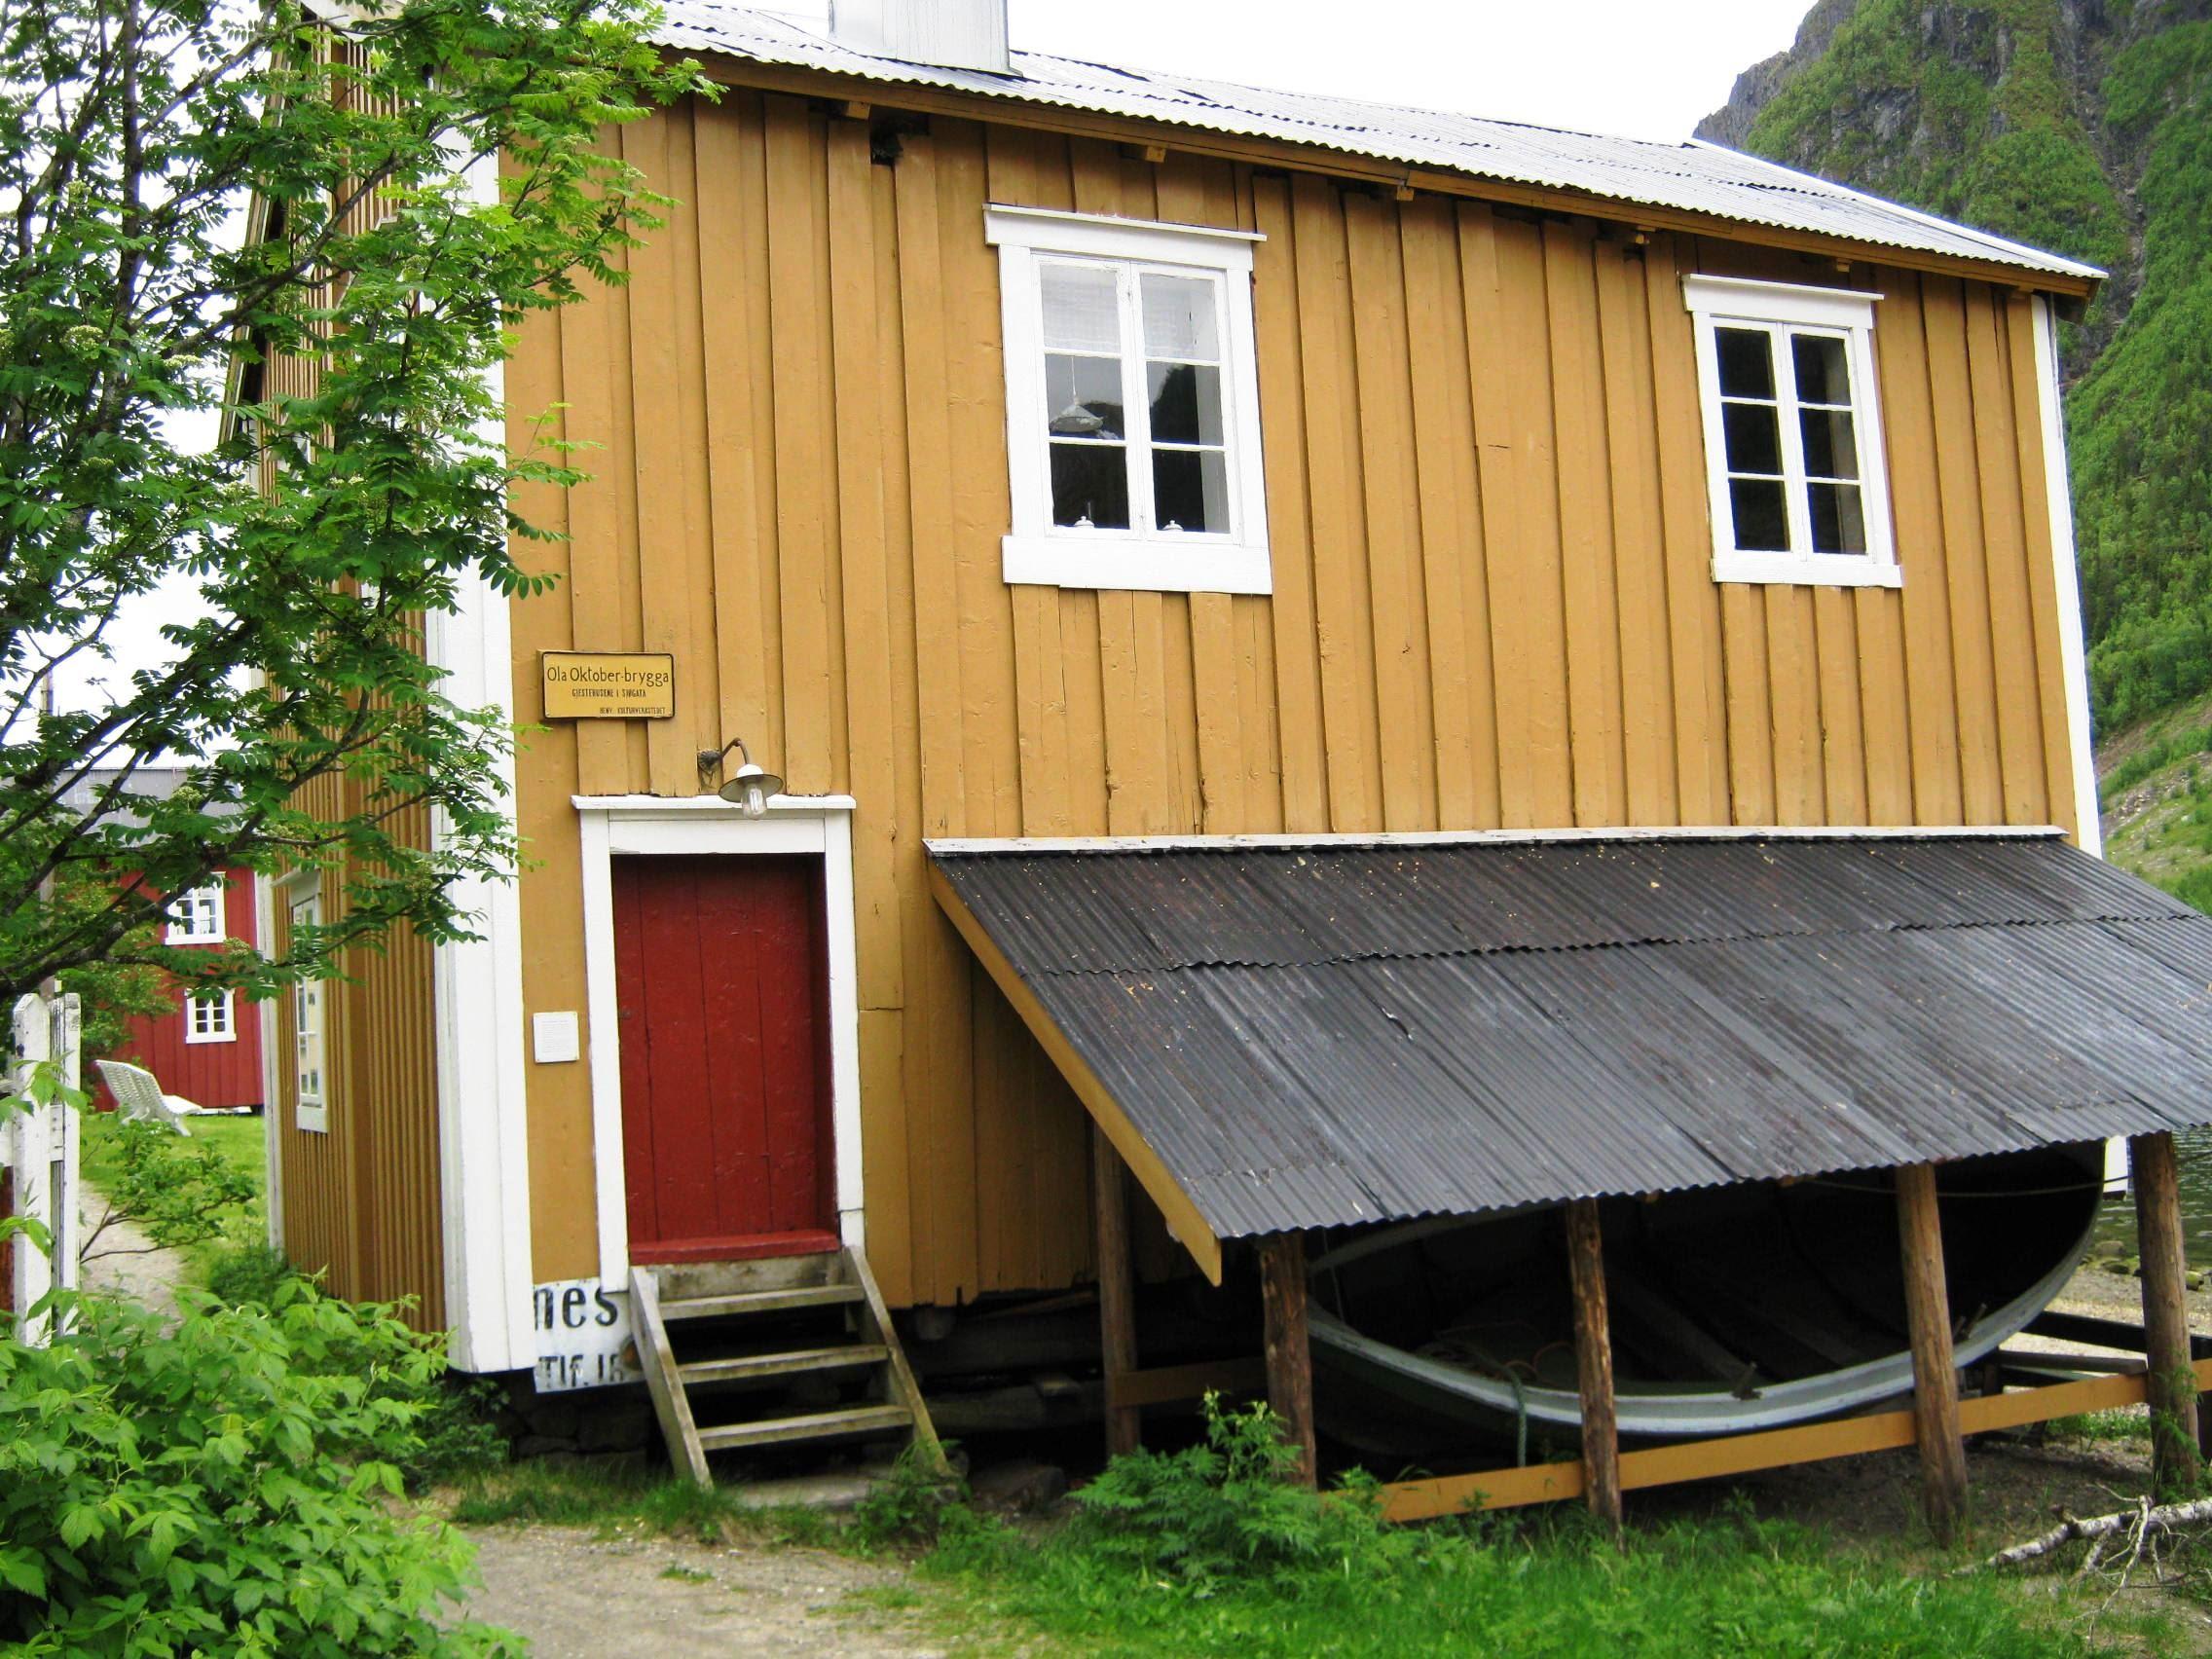 The historic Guesthouses in Sjøgata, Mosjøen